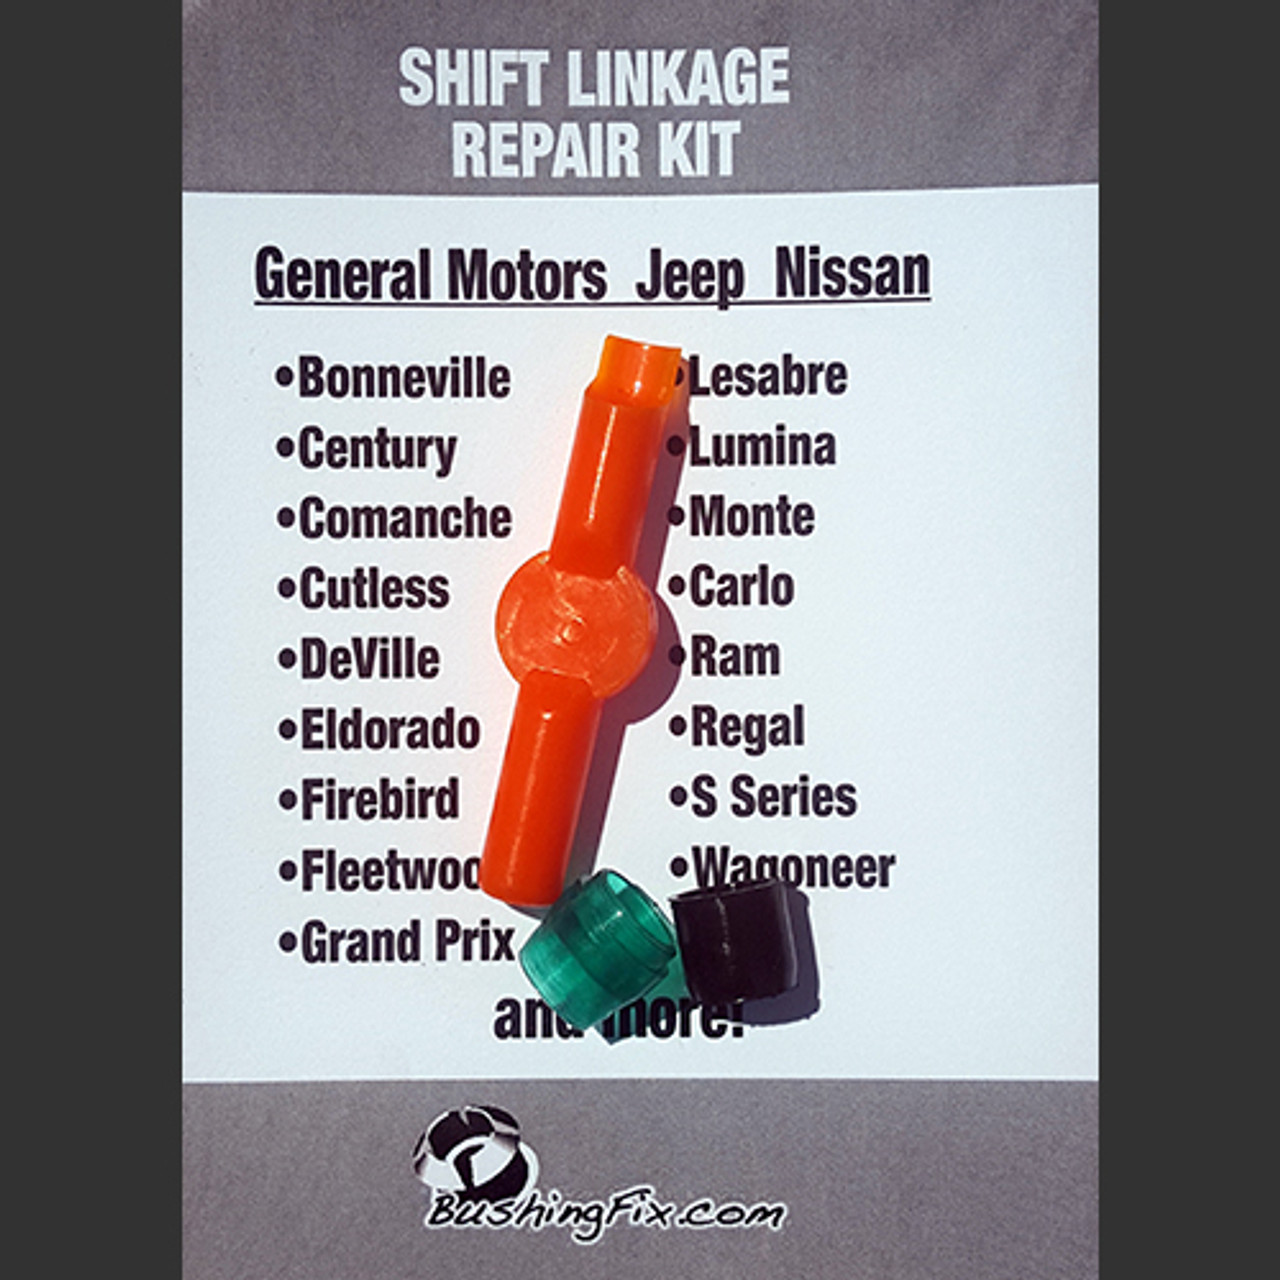 Oldsmobile LSS bushing repair kit